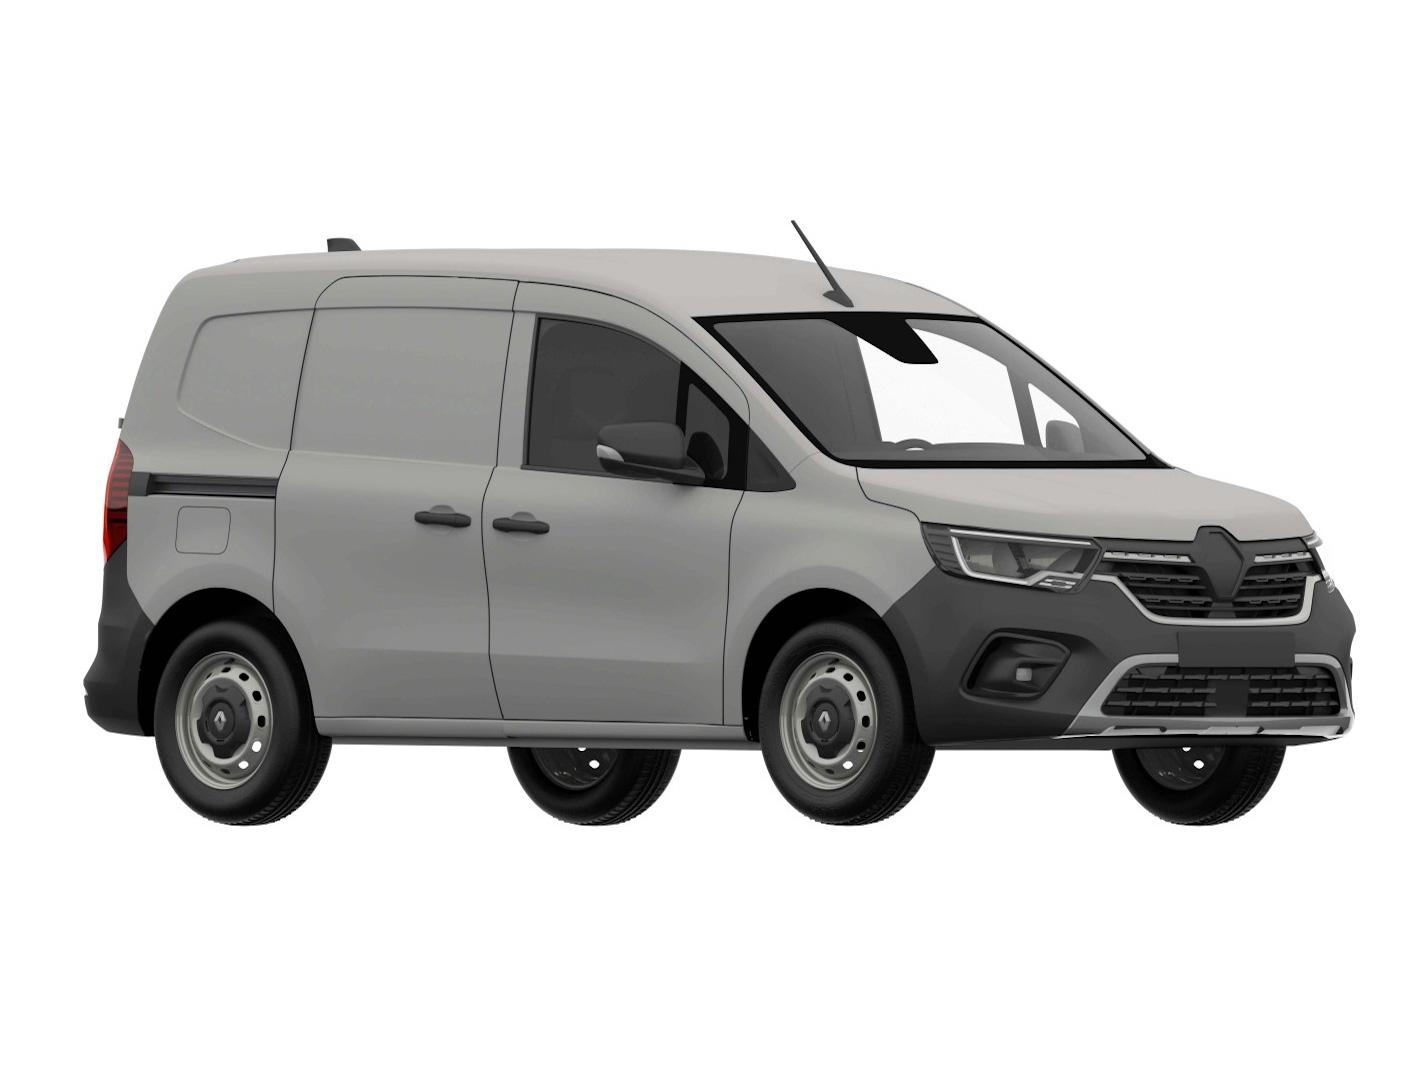 2020 - [Renault] Kangoo III - Page 13 Renault-Kangoo-2020-1